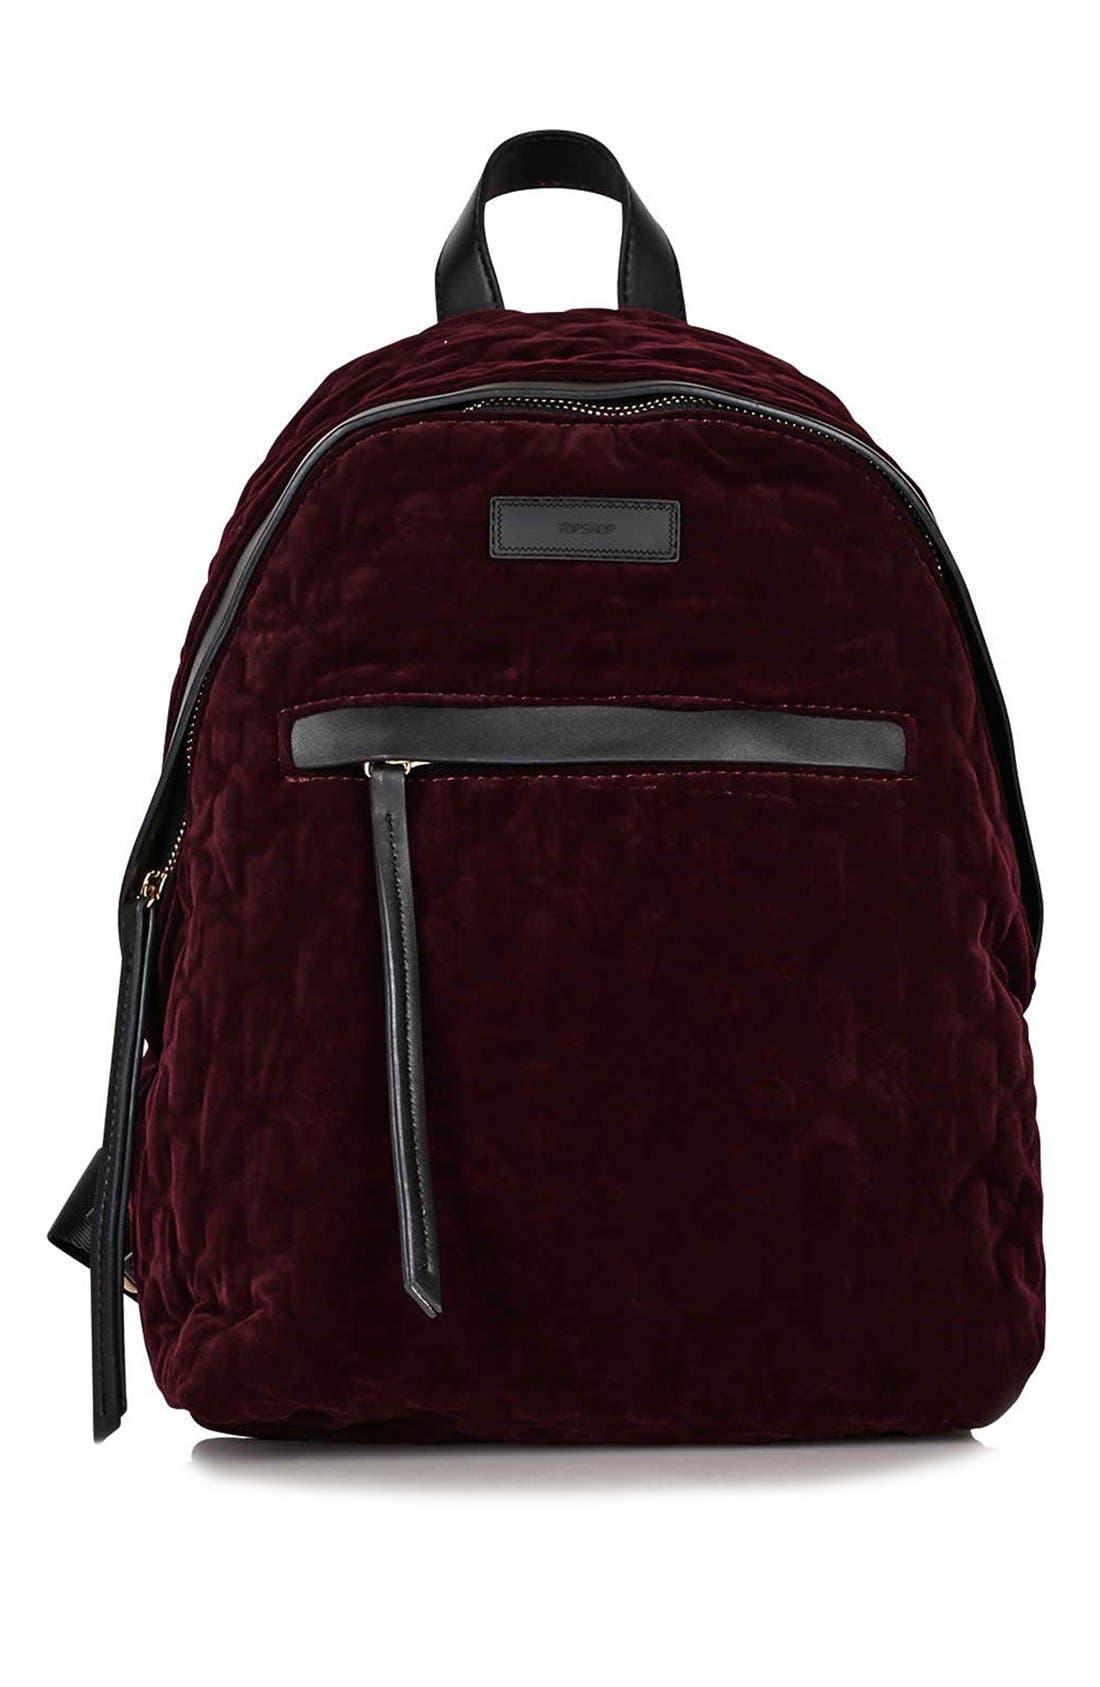 Alternate Image 1 Selected - Topshop 'Bristol' Velvet Backpack